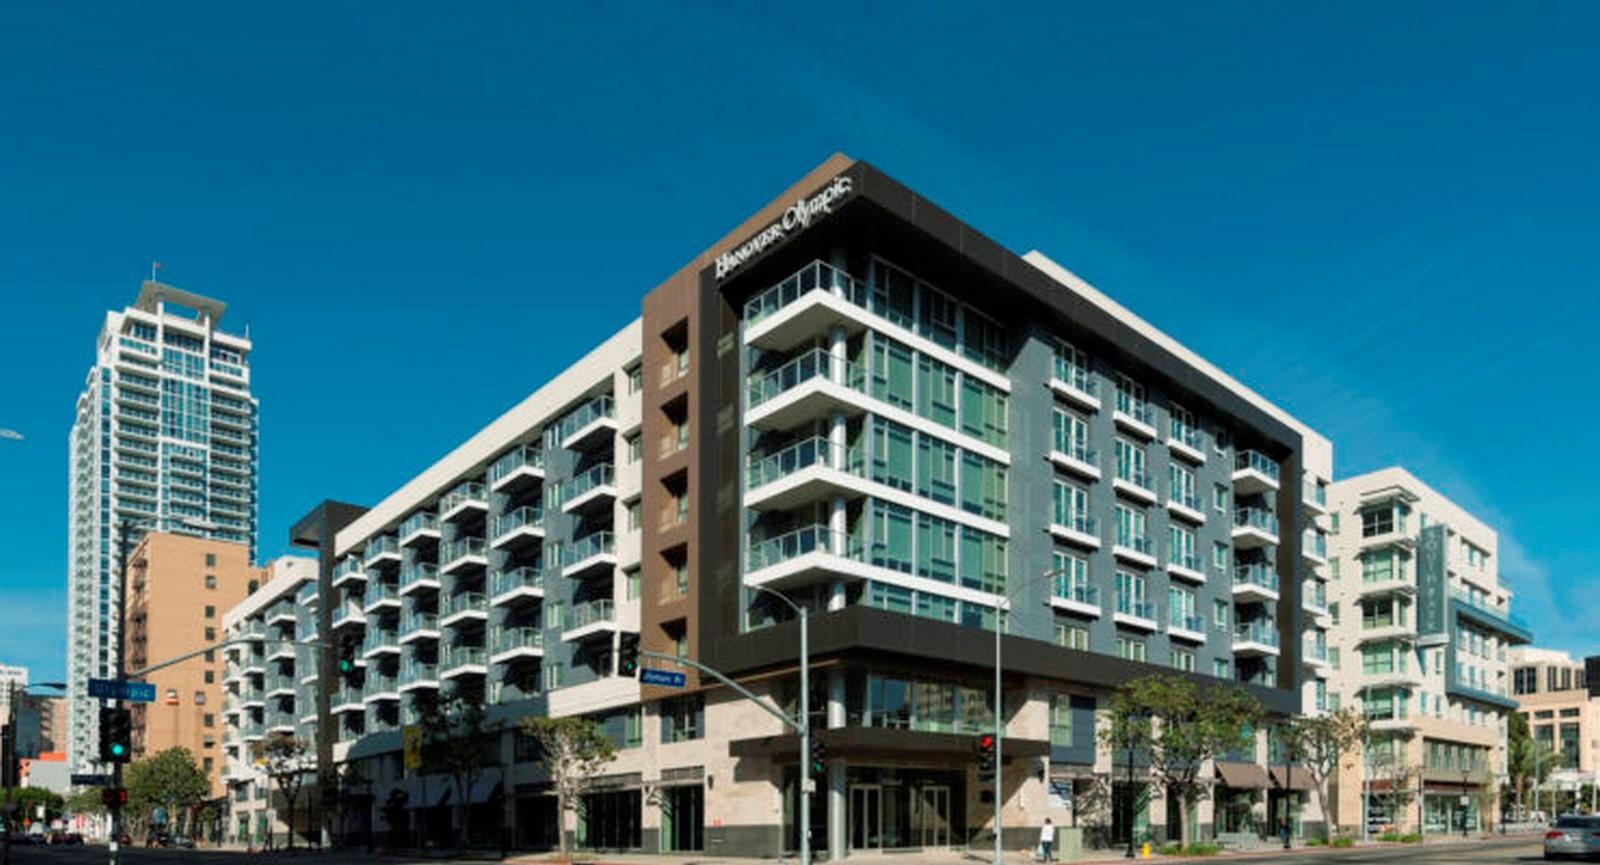 Hanover Olympic Building - Sheet2